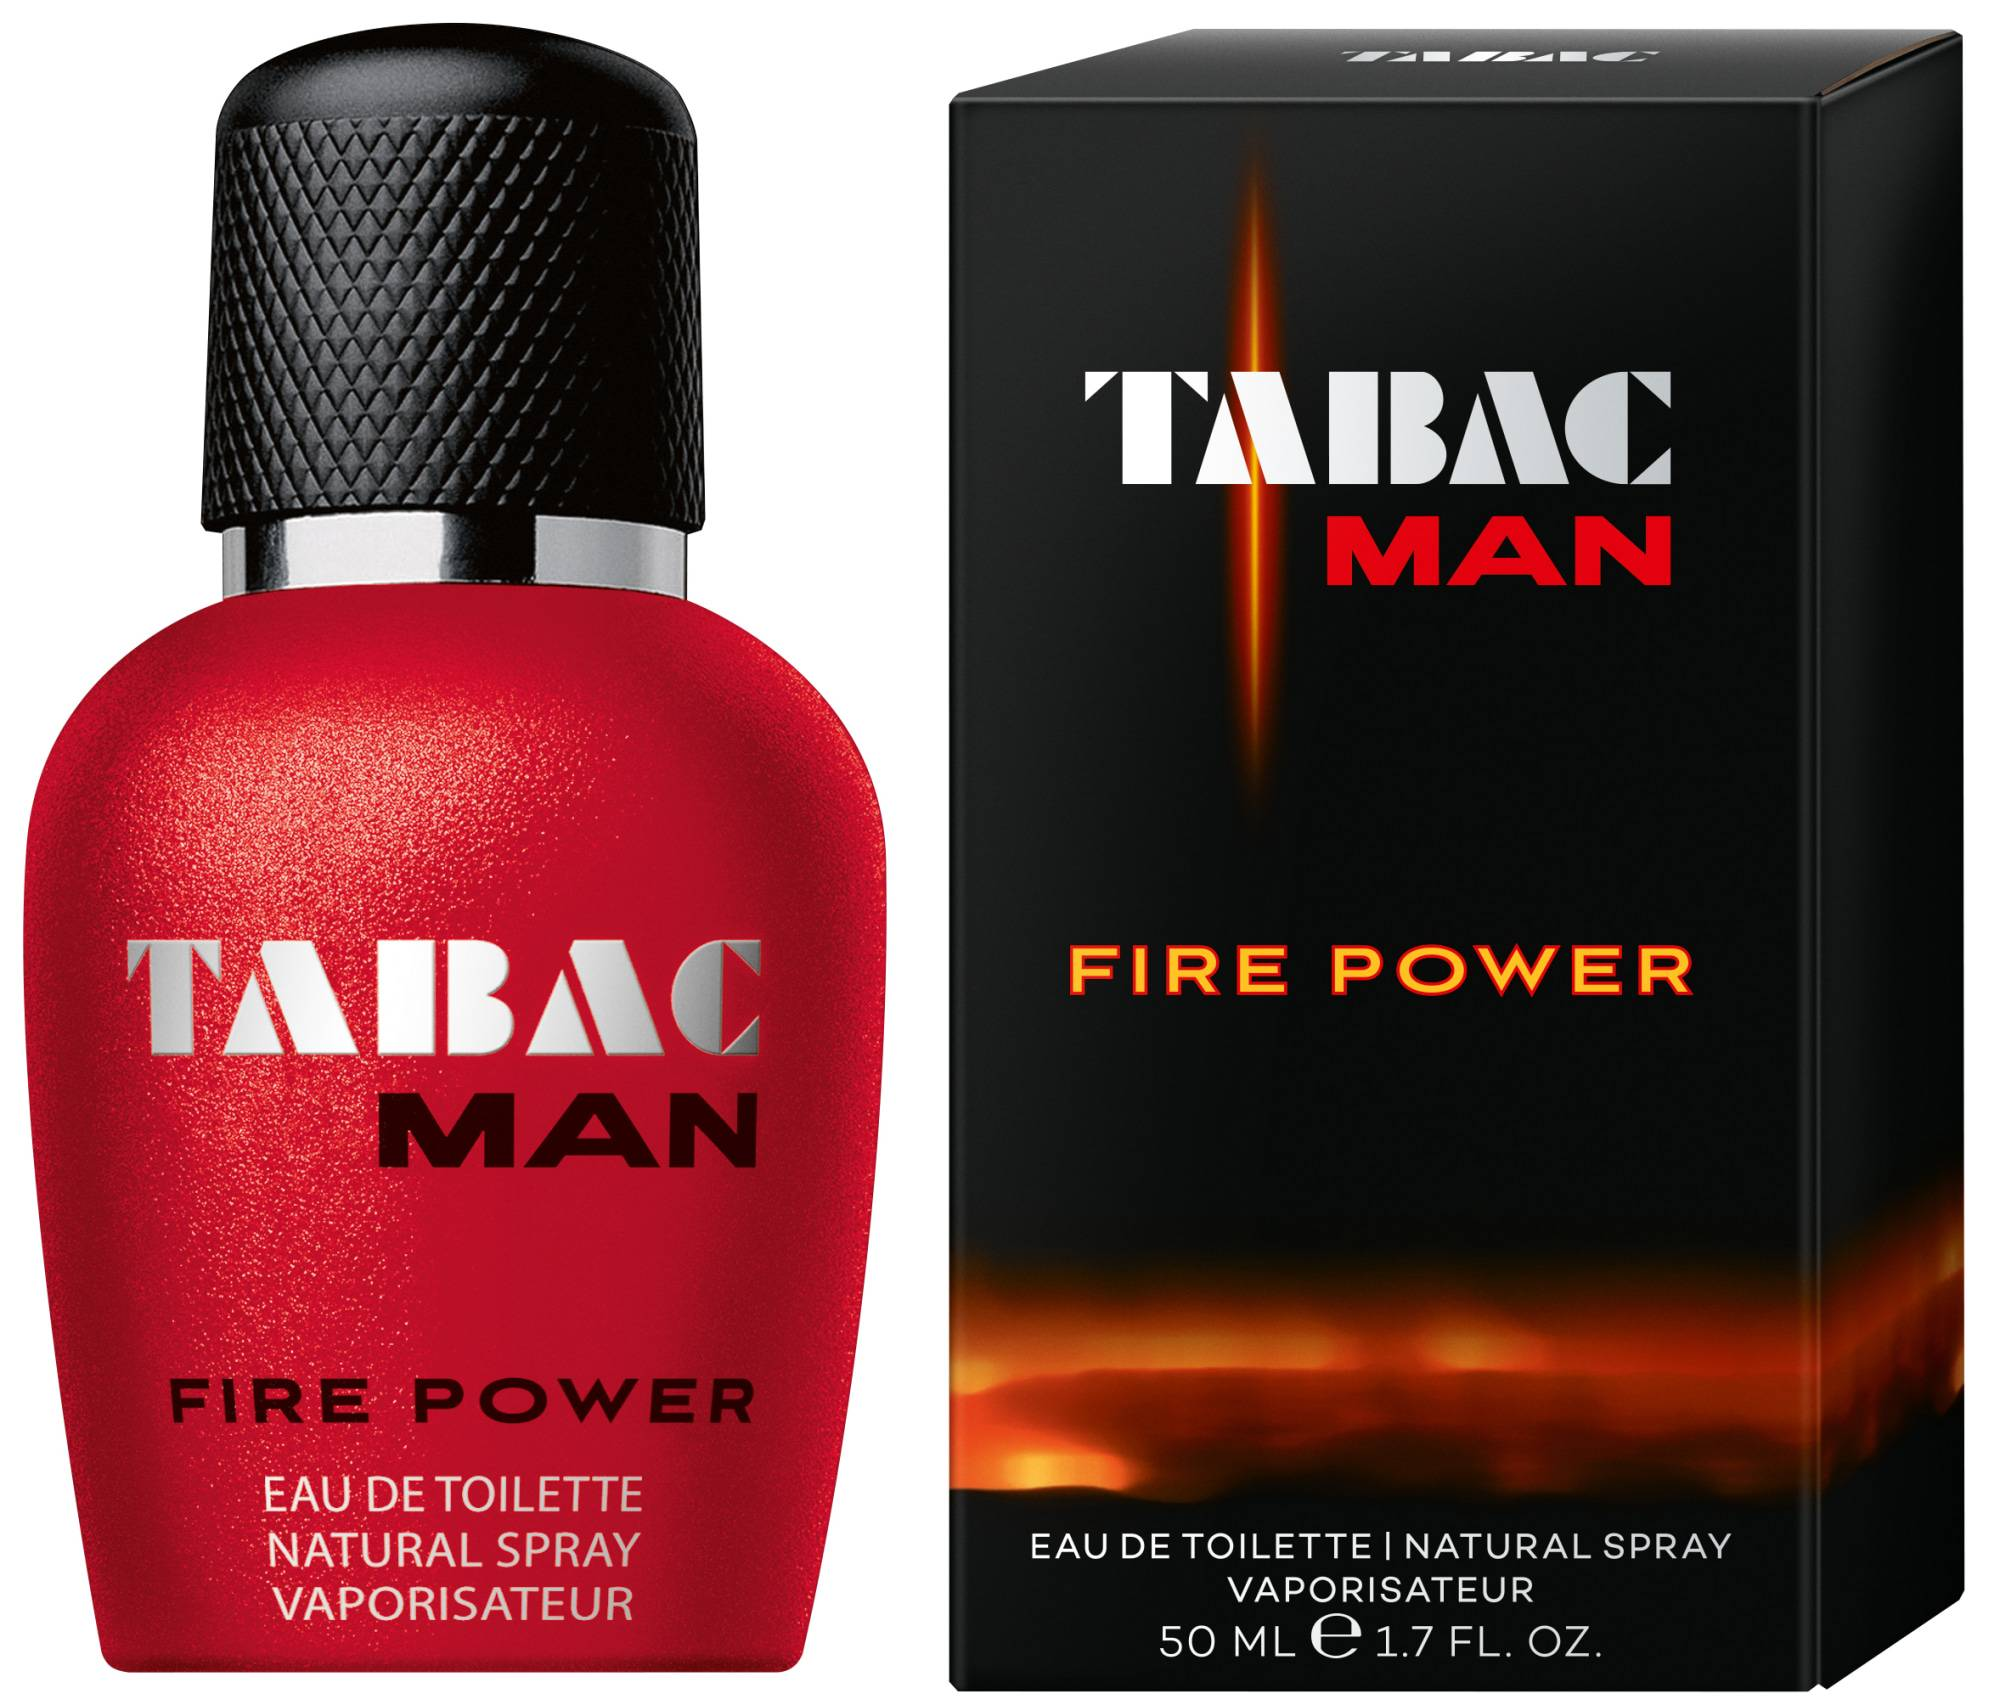 Tabac Man Fire Power EdT 50 ml miesten deodoranttispray